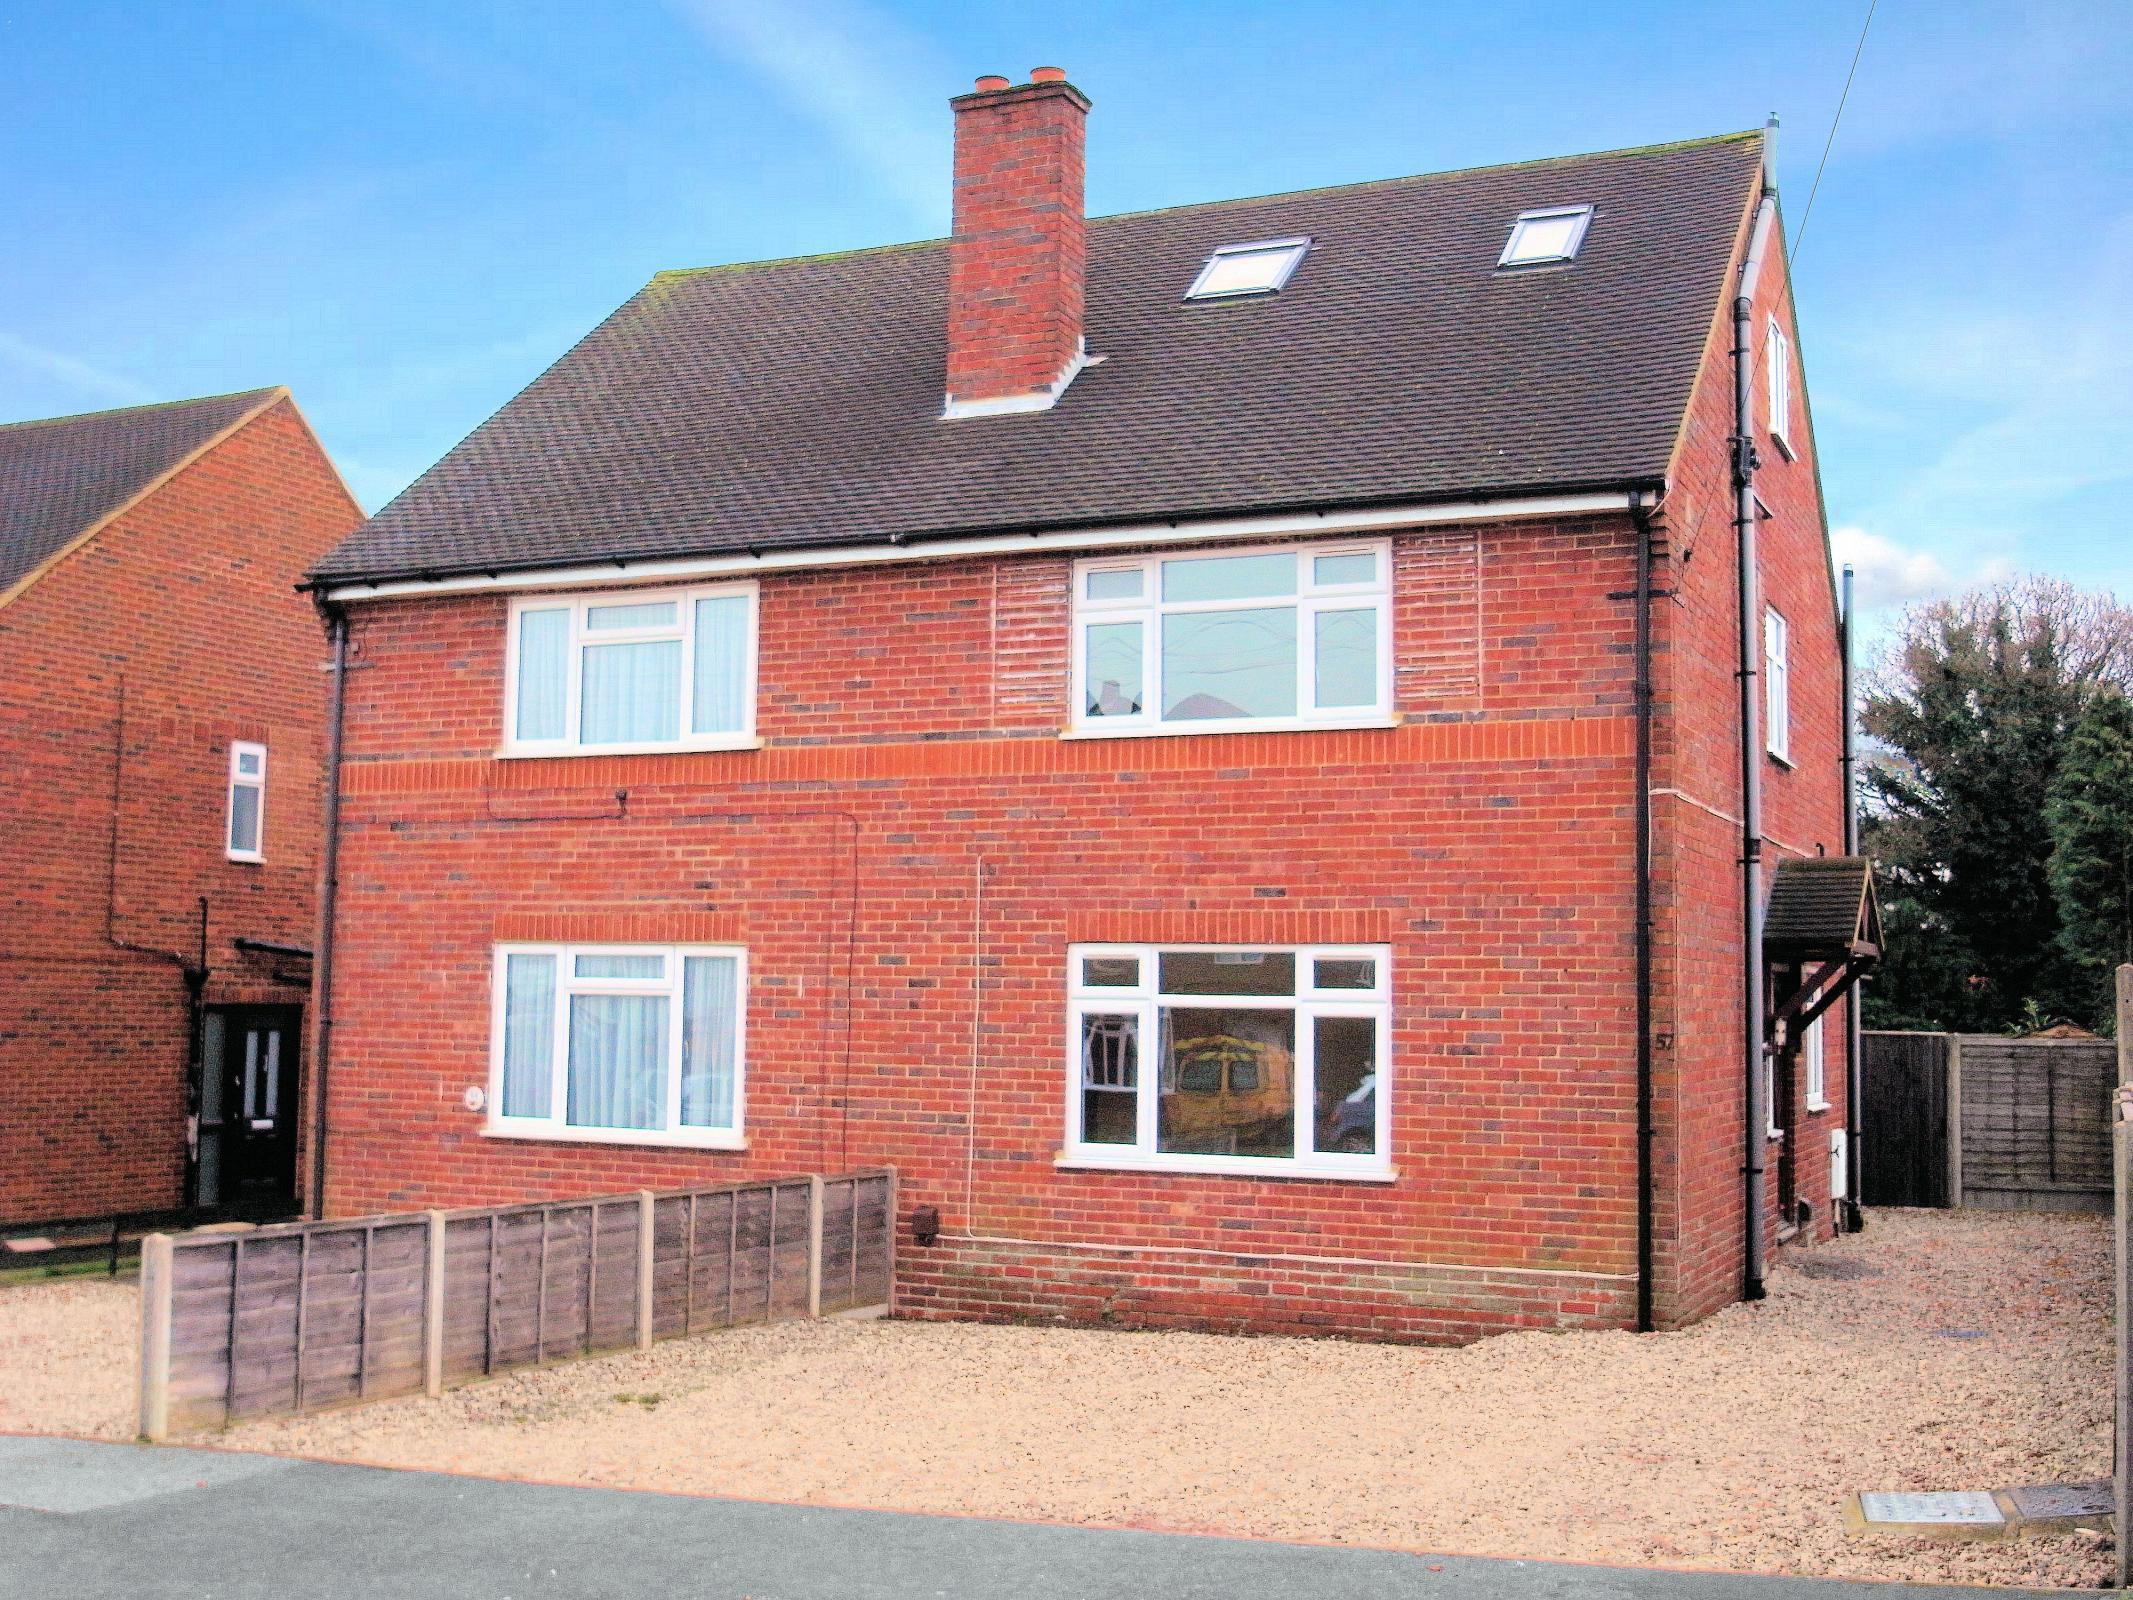 3 Bedrooms Semi Detached House for sale in Saffron Platt, Guildford, Surrey, GU2